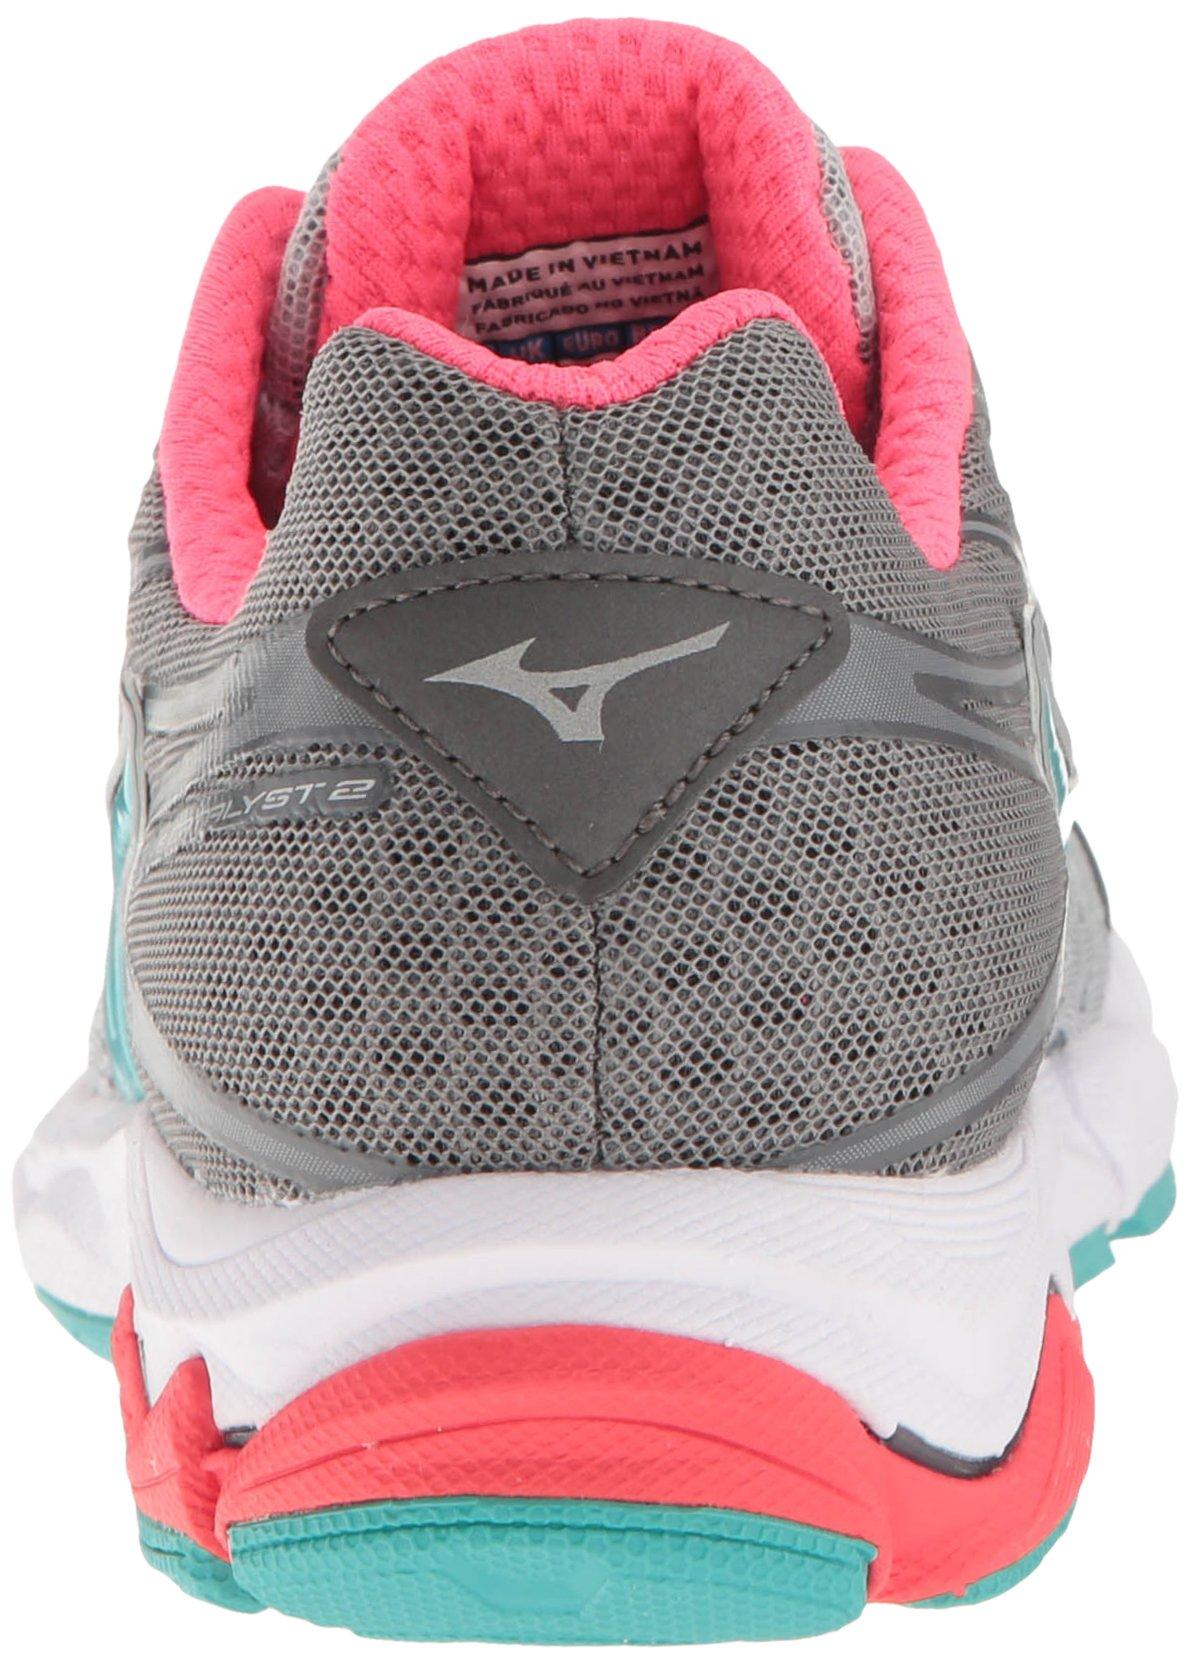 Mizuno Women's Wave Catalyst 2 Running Shoe, Grey/Mint, 9 B US by Mizuno (Image #2)